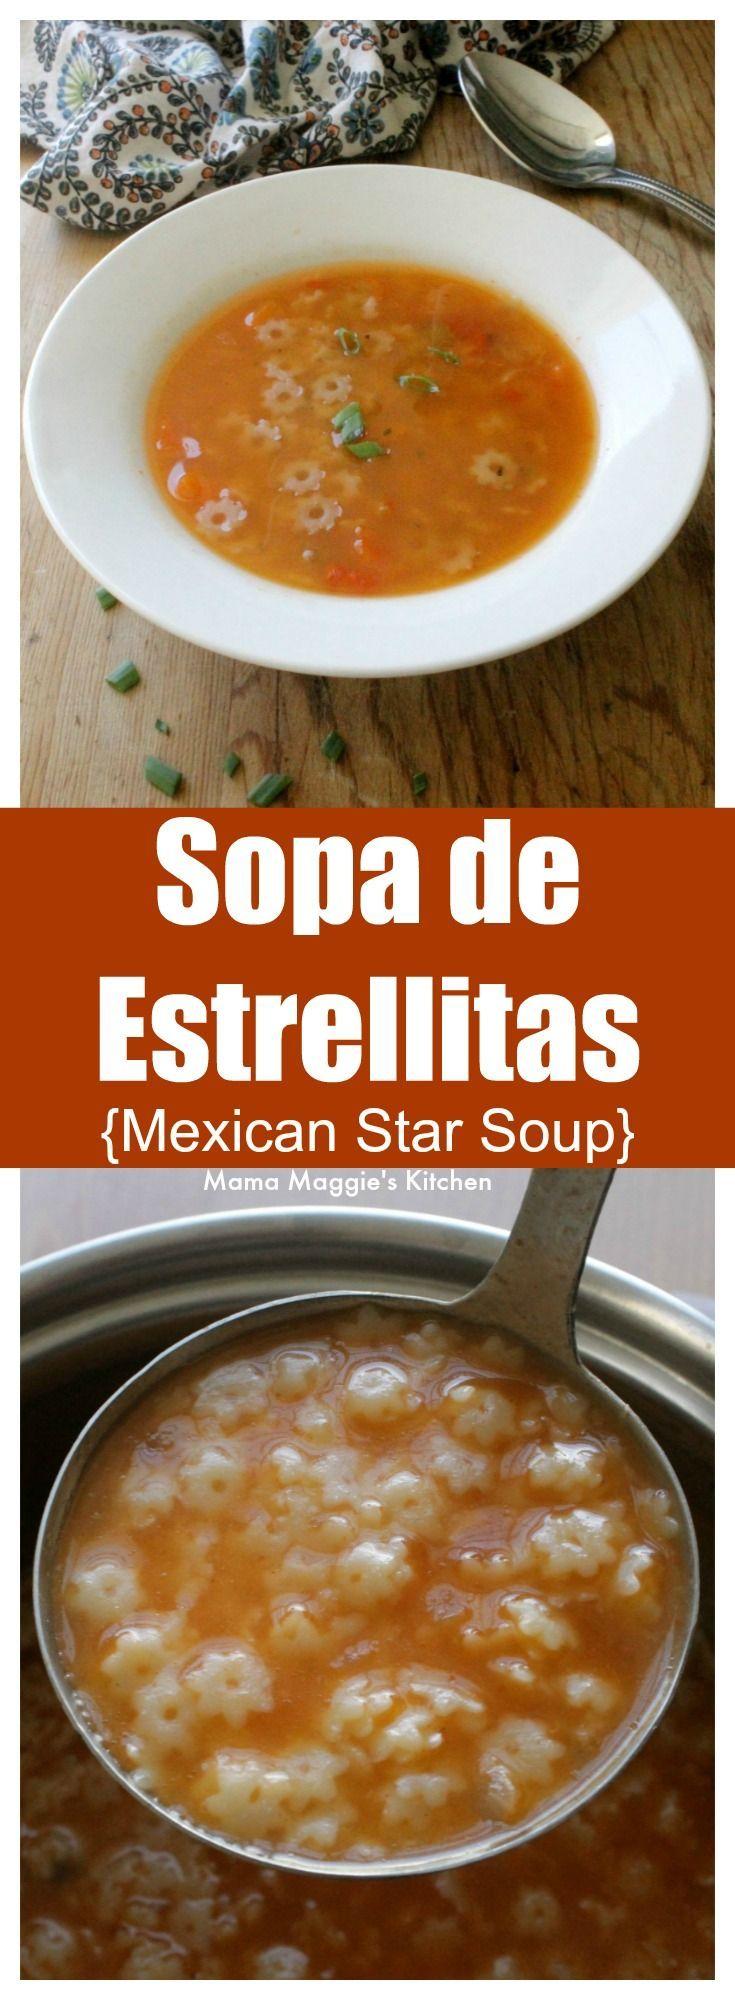 Sopa de Estrellitas